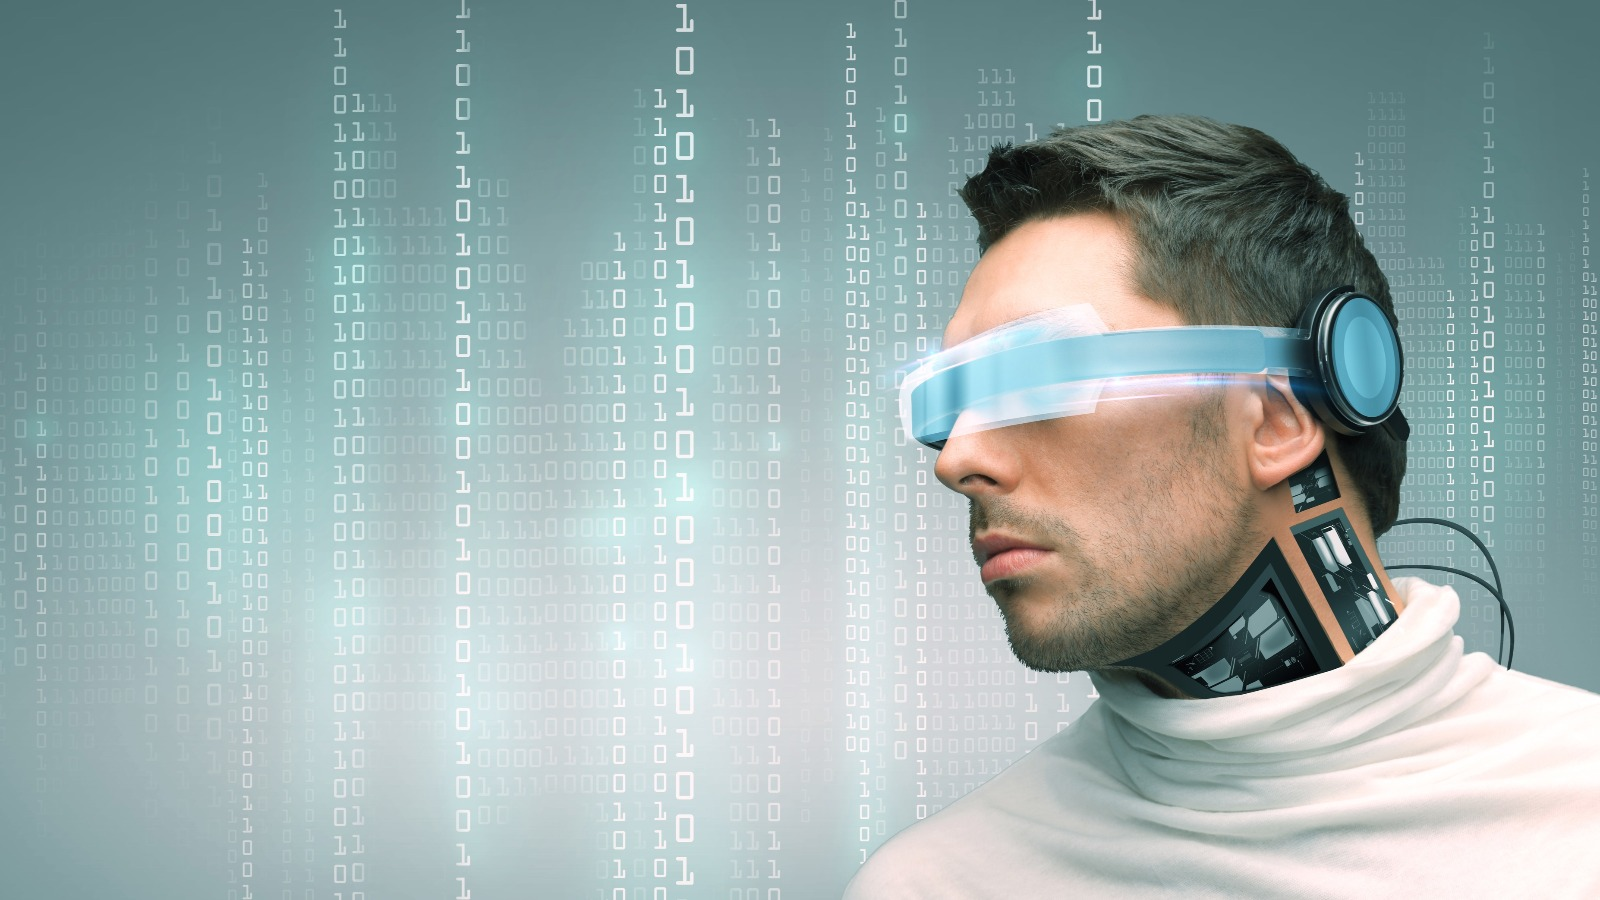 Man-with-futuristic-glasses-and-sensors.jpg